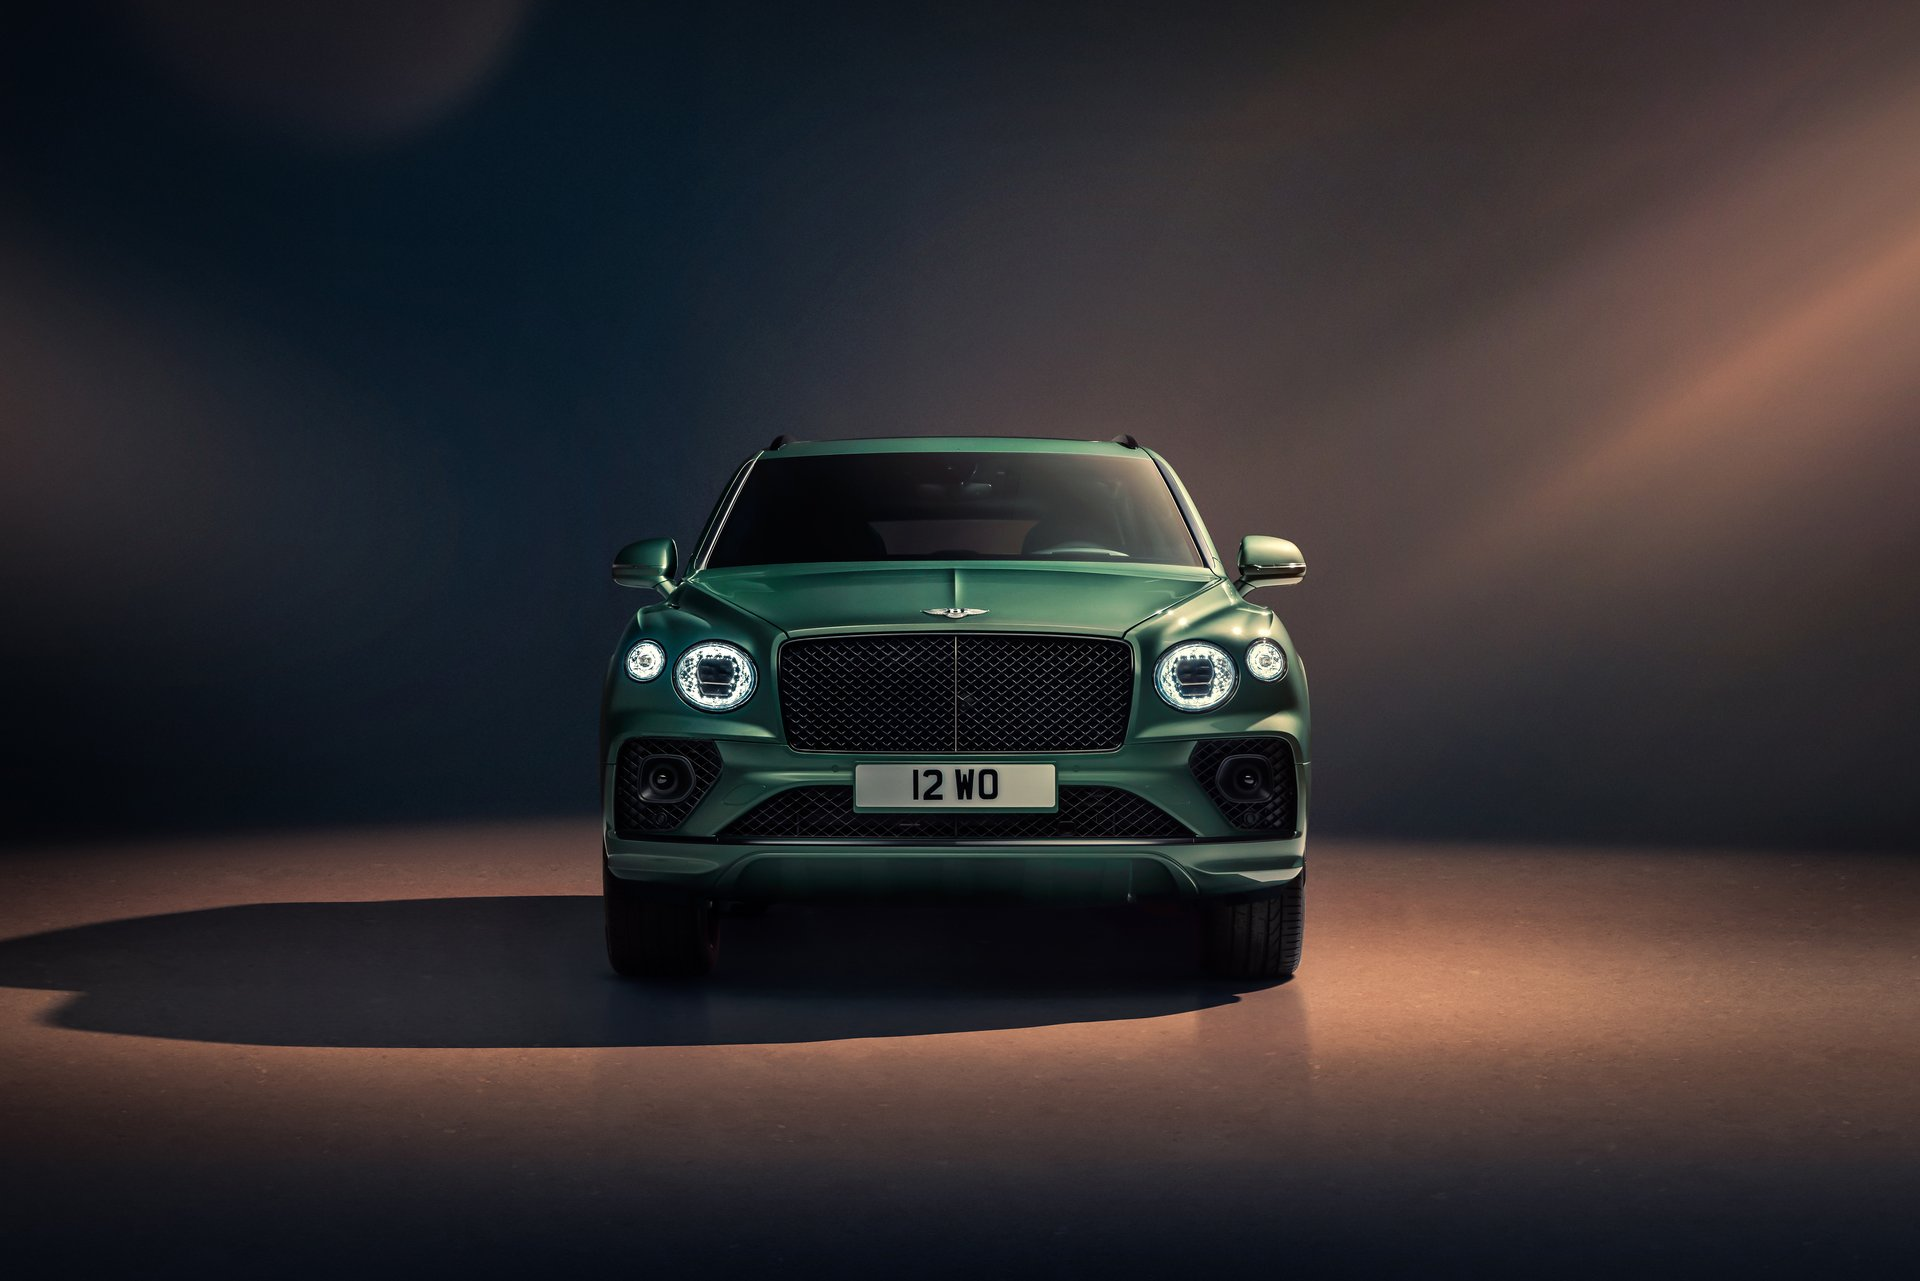 New Bentley Bentayga The Definitive Luxury Suv Watch I Love